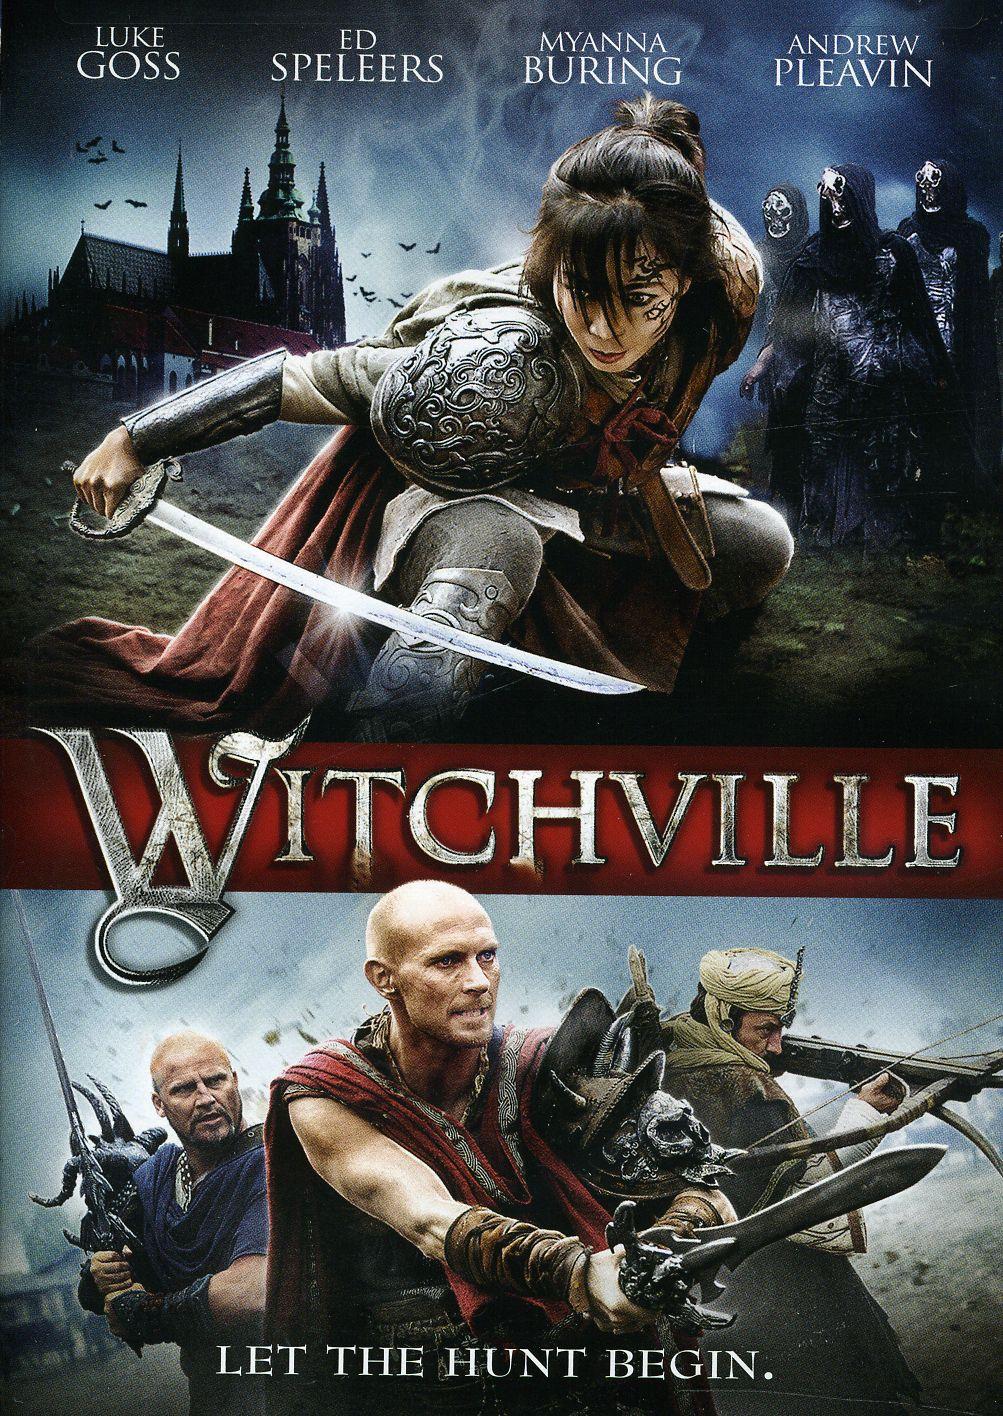 Witchville (DVD)